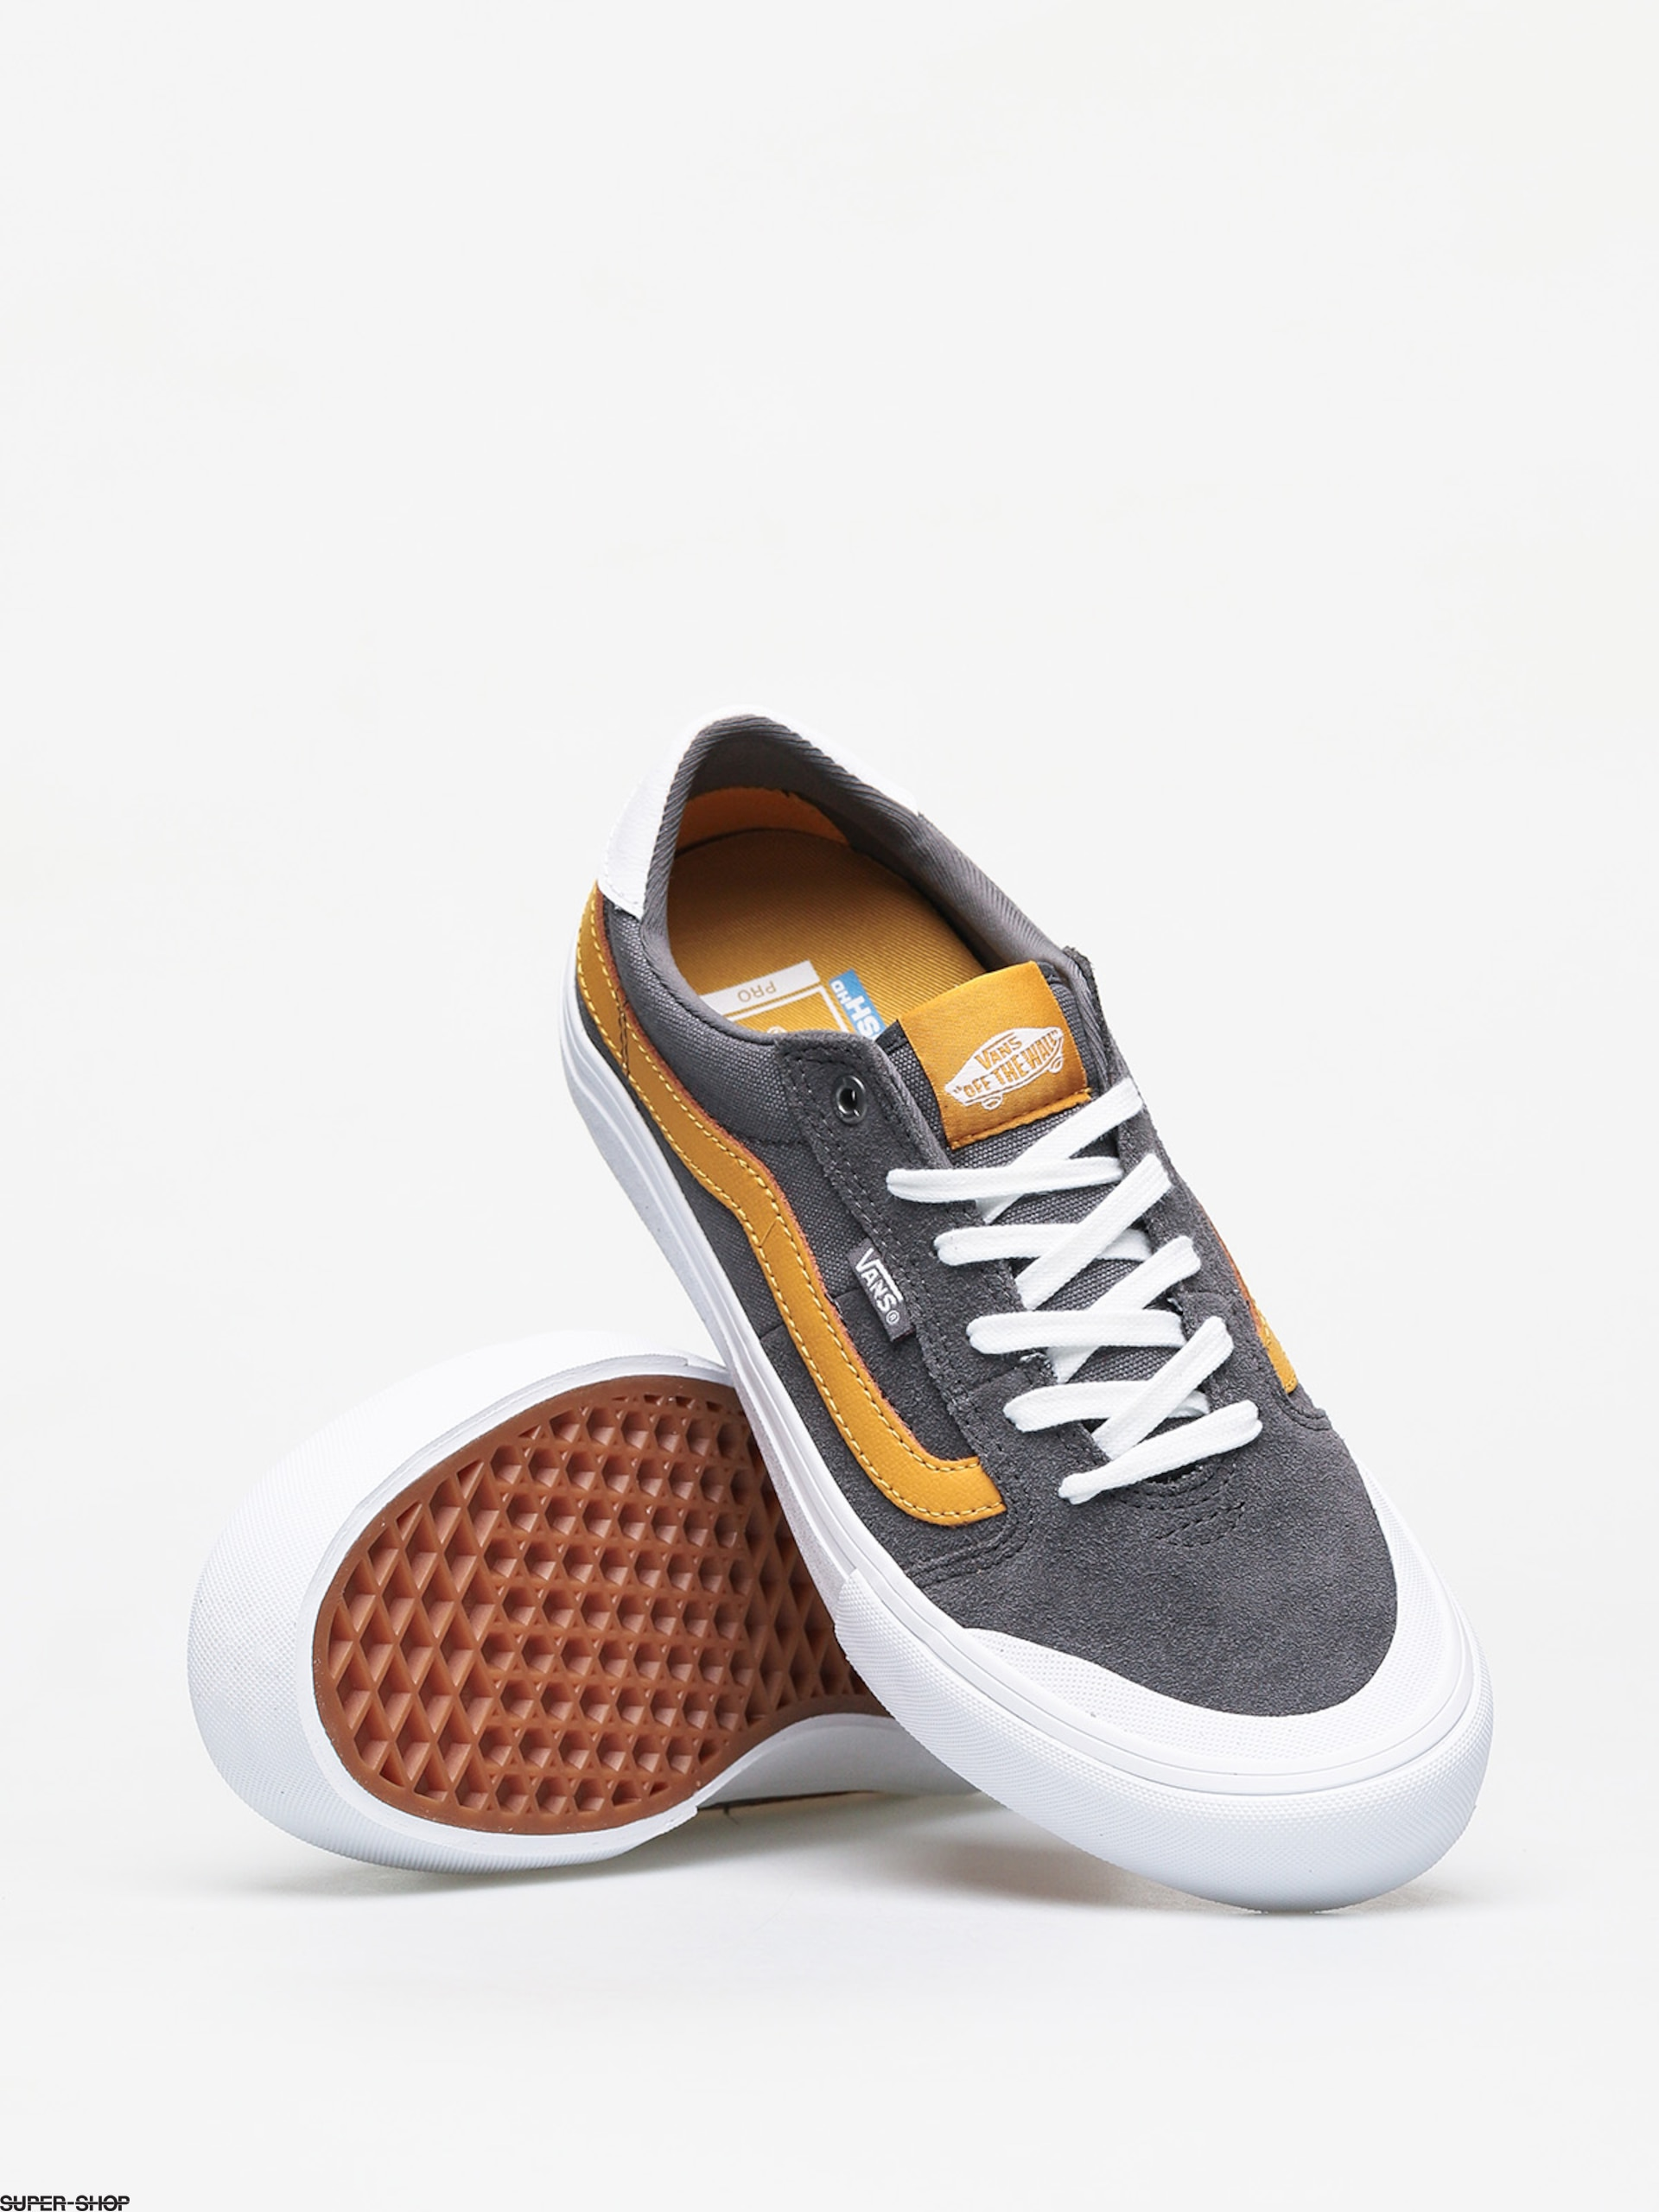 Vans Style 112 Pro Shoes (pewter/mango